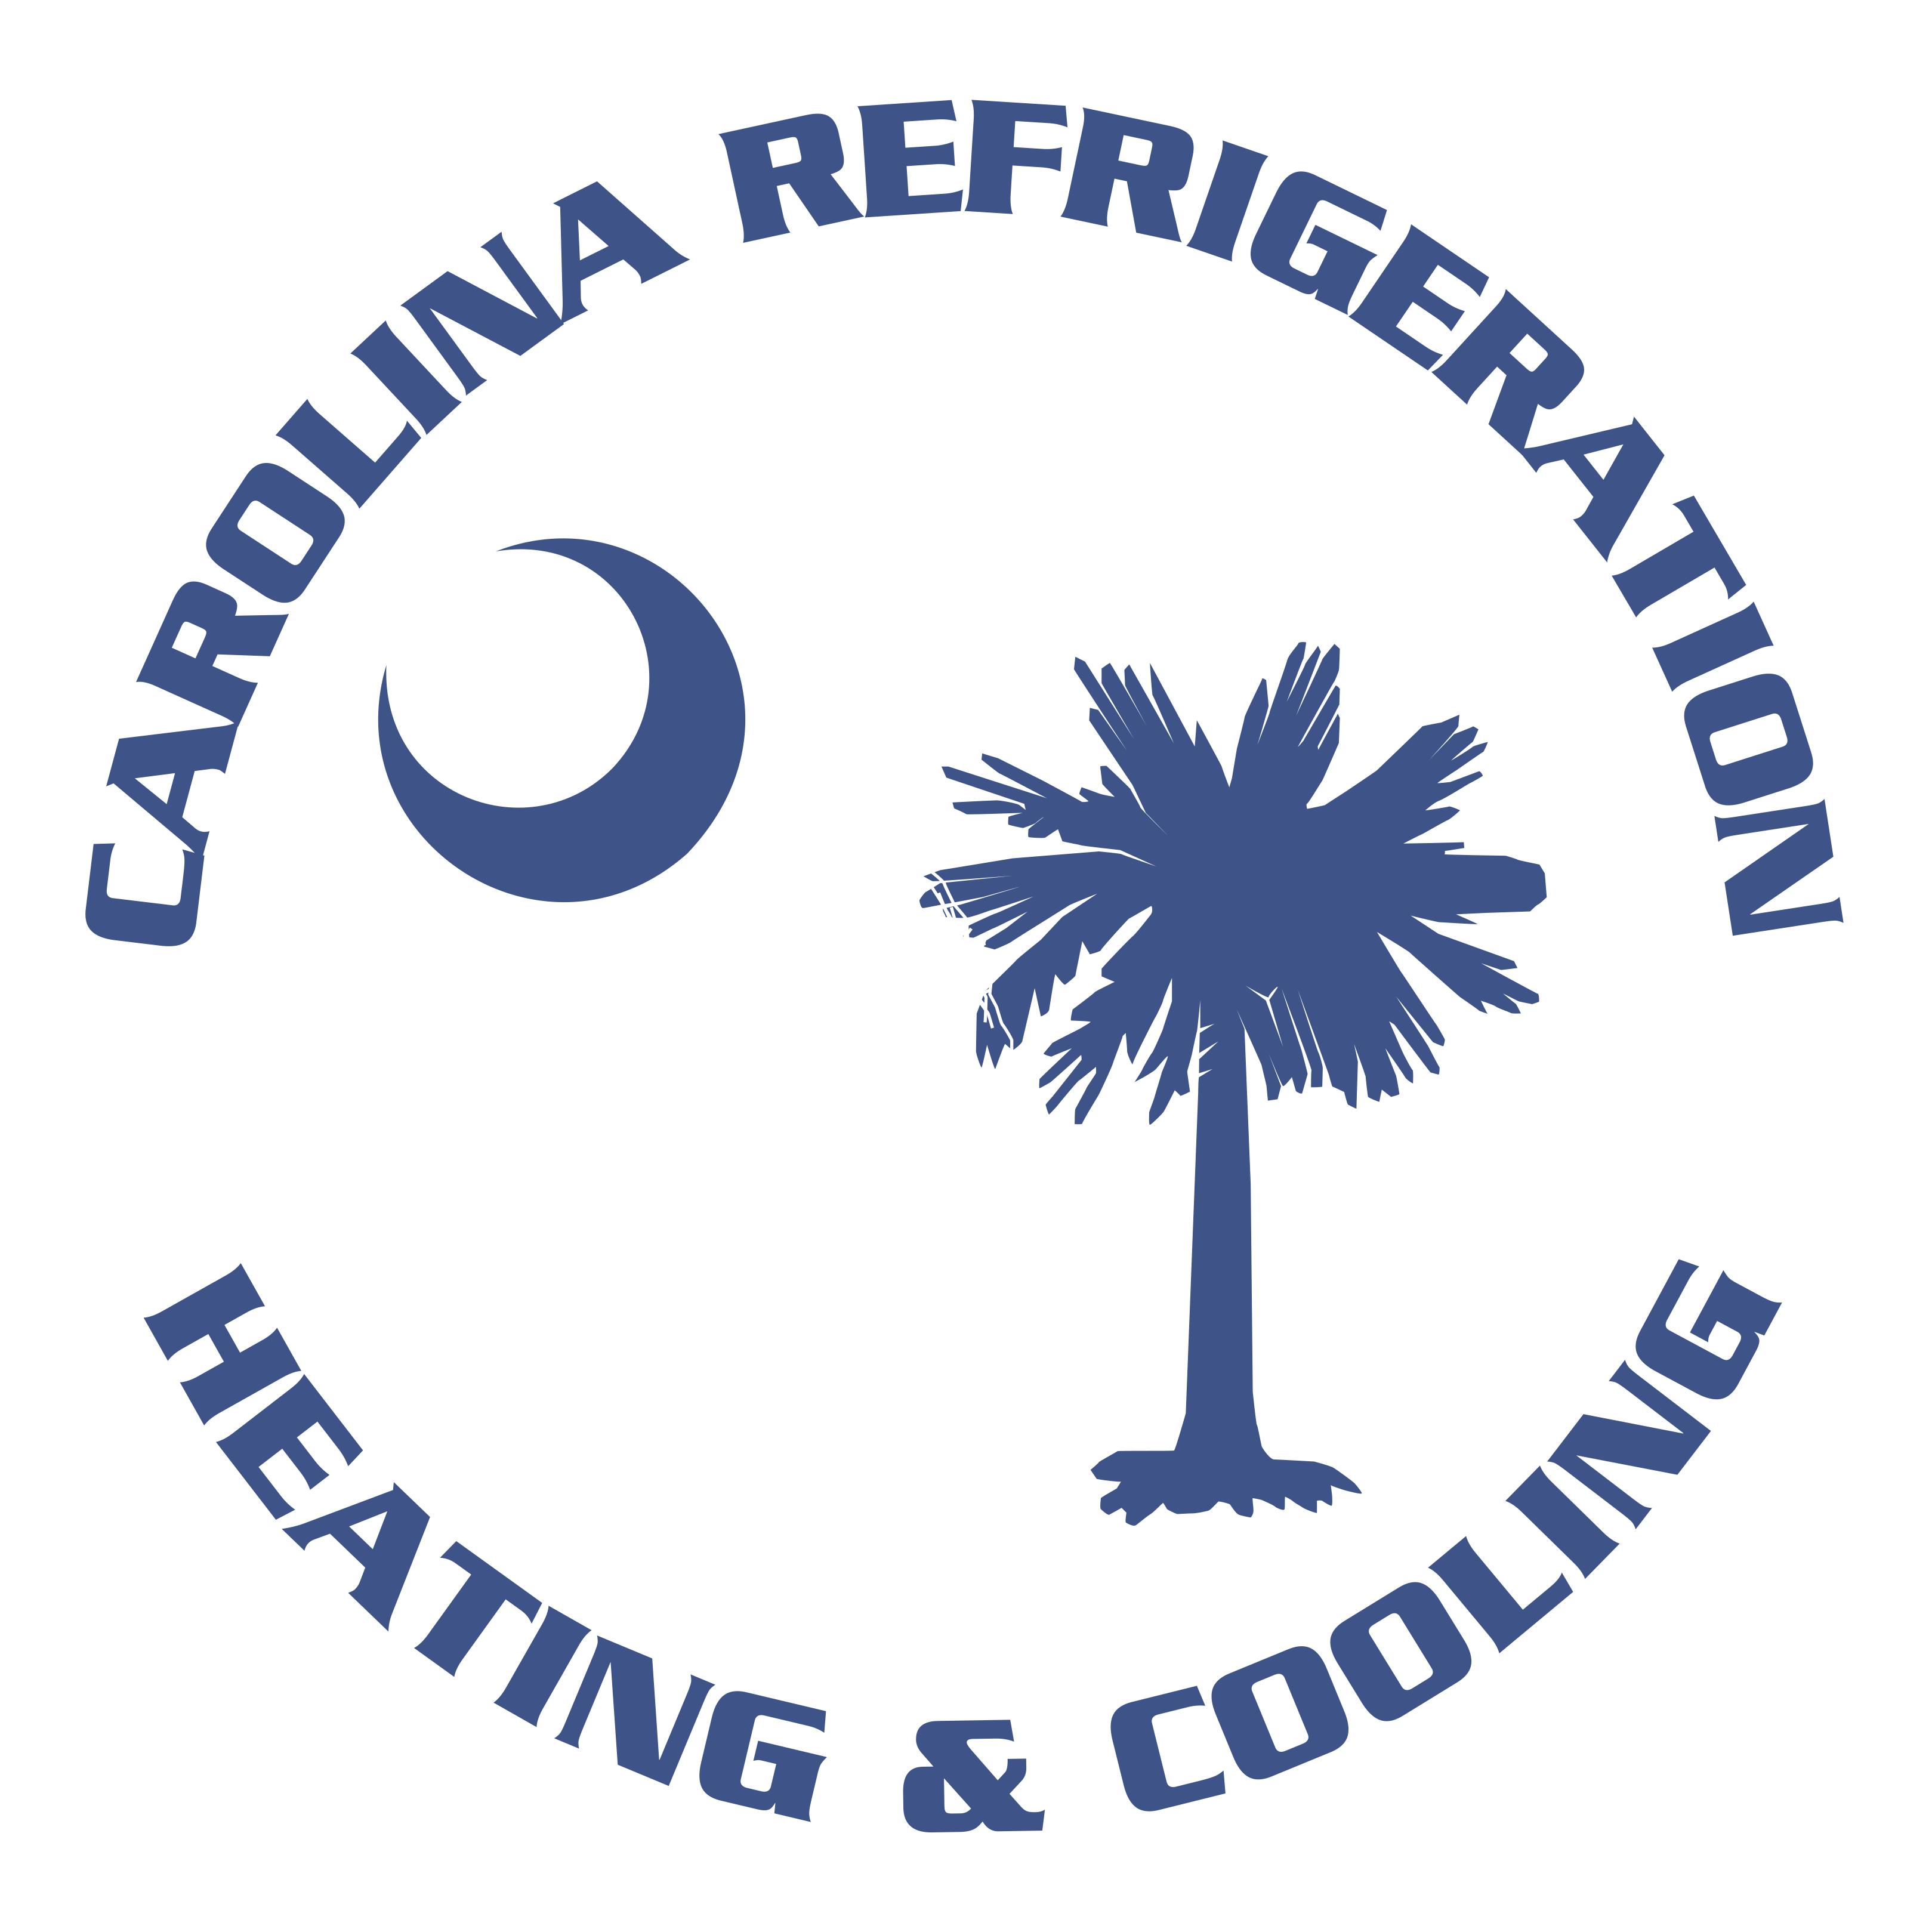 Carolina Refrigeration Heating and Cooling - Rock Hill, SC 29730 - (803)984-4173 | ShowMeLocal.com